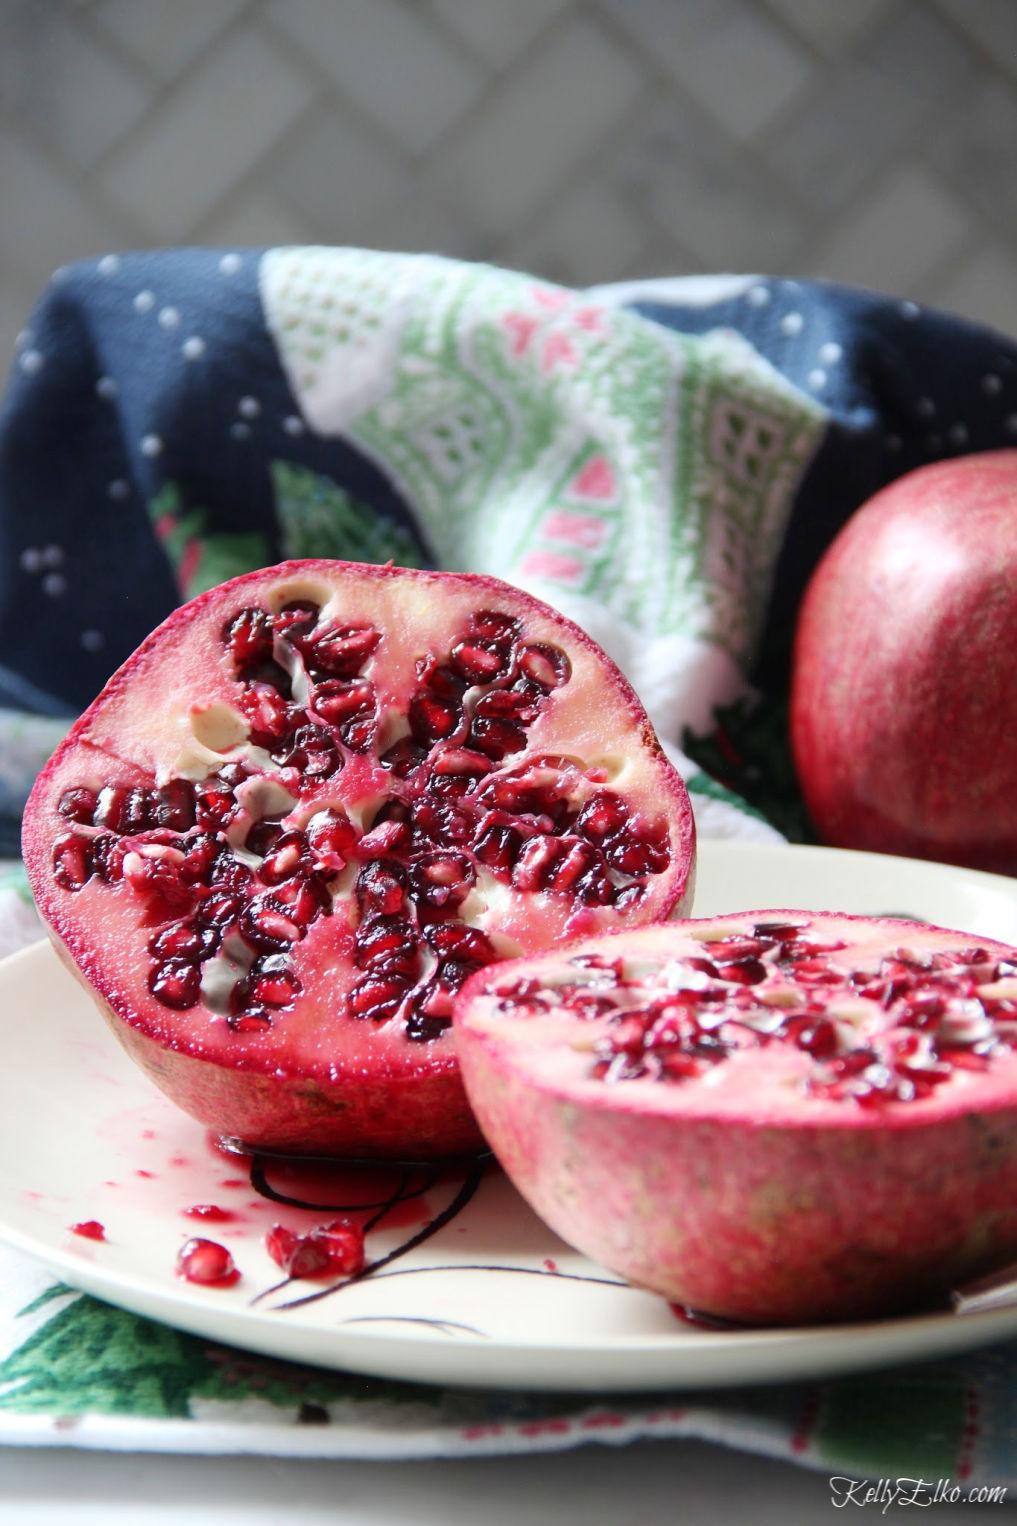 Pomegranate seeds are delish! kellyelko.com #pomegranate